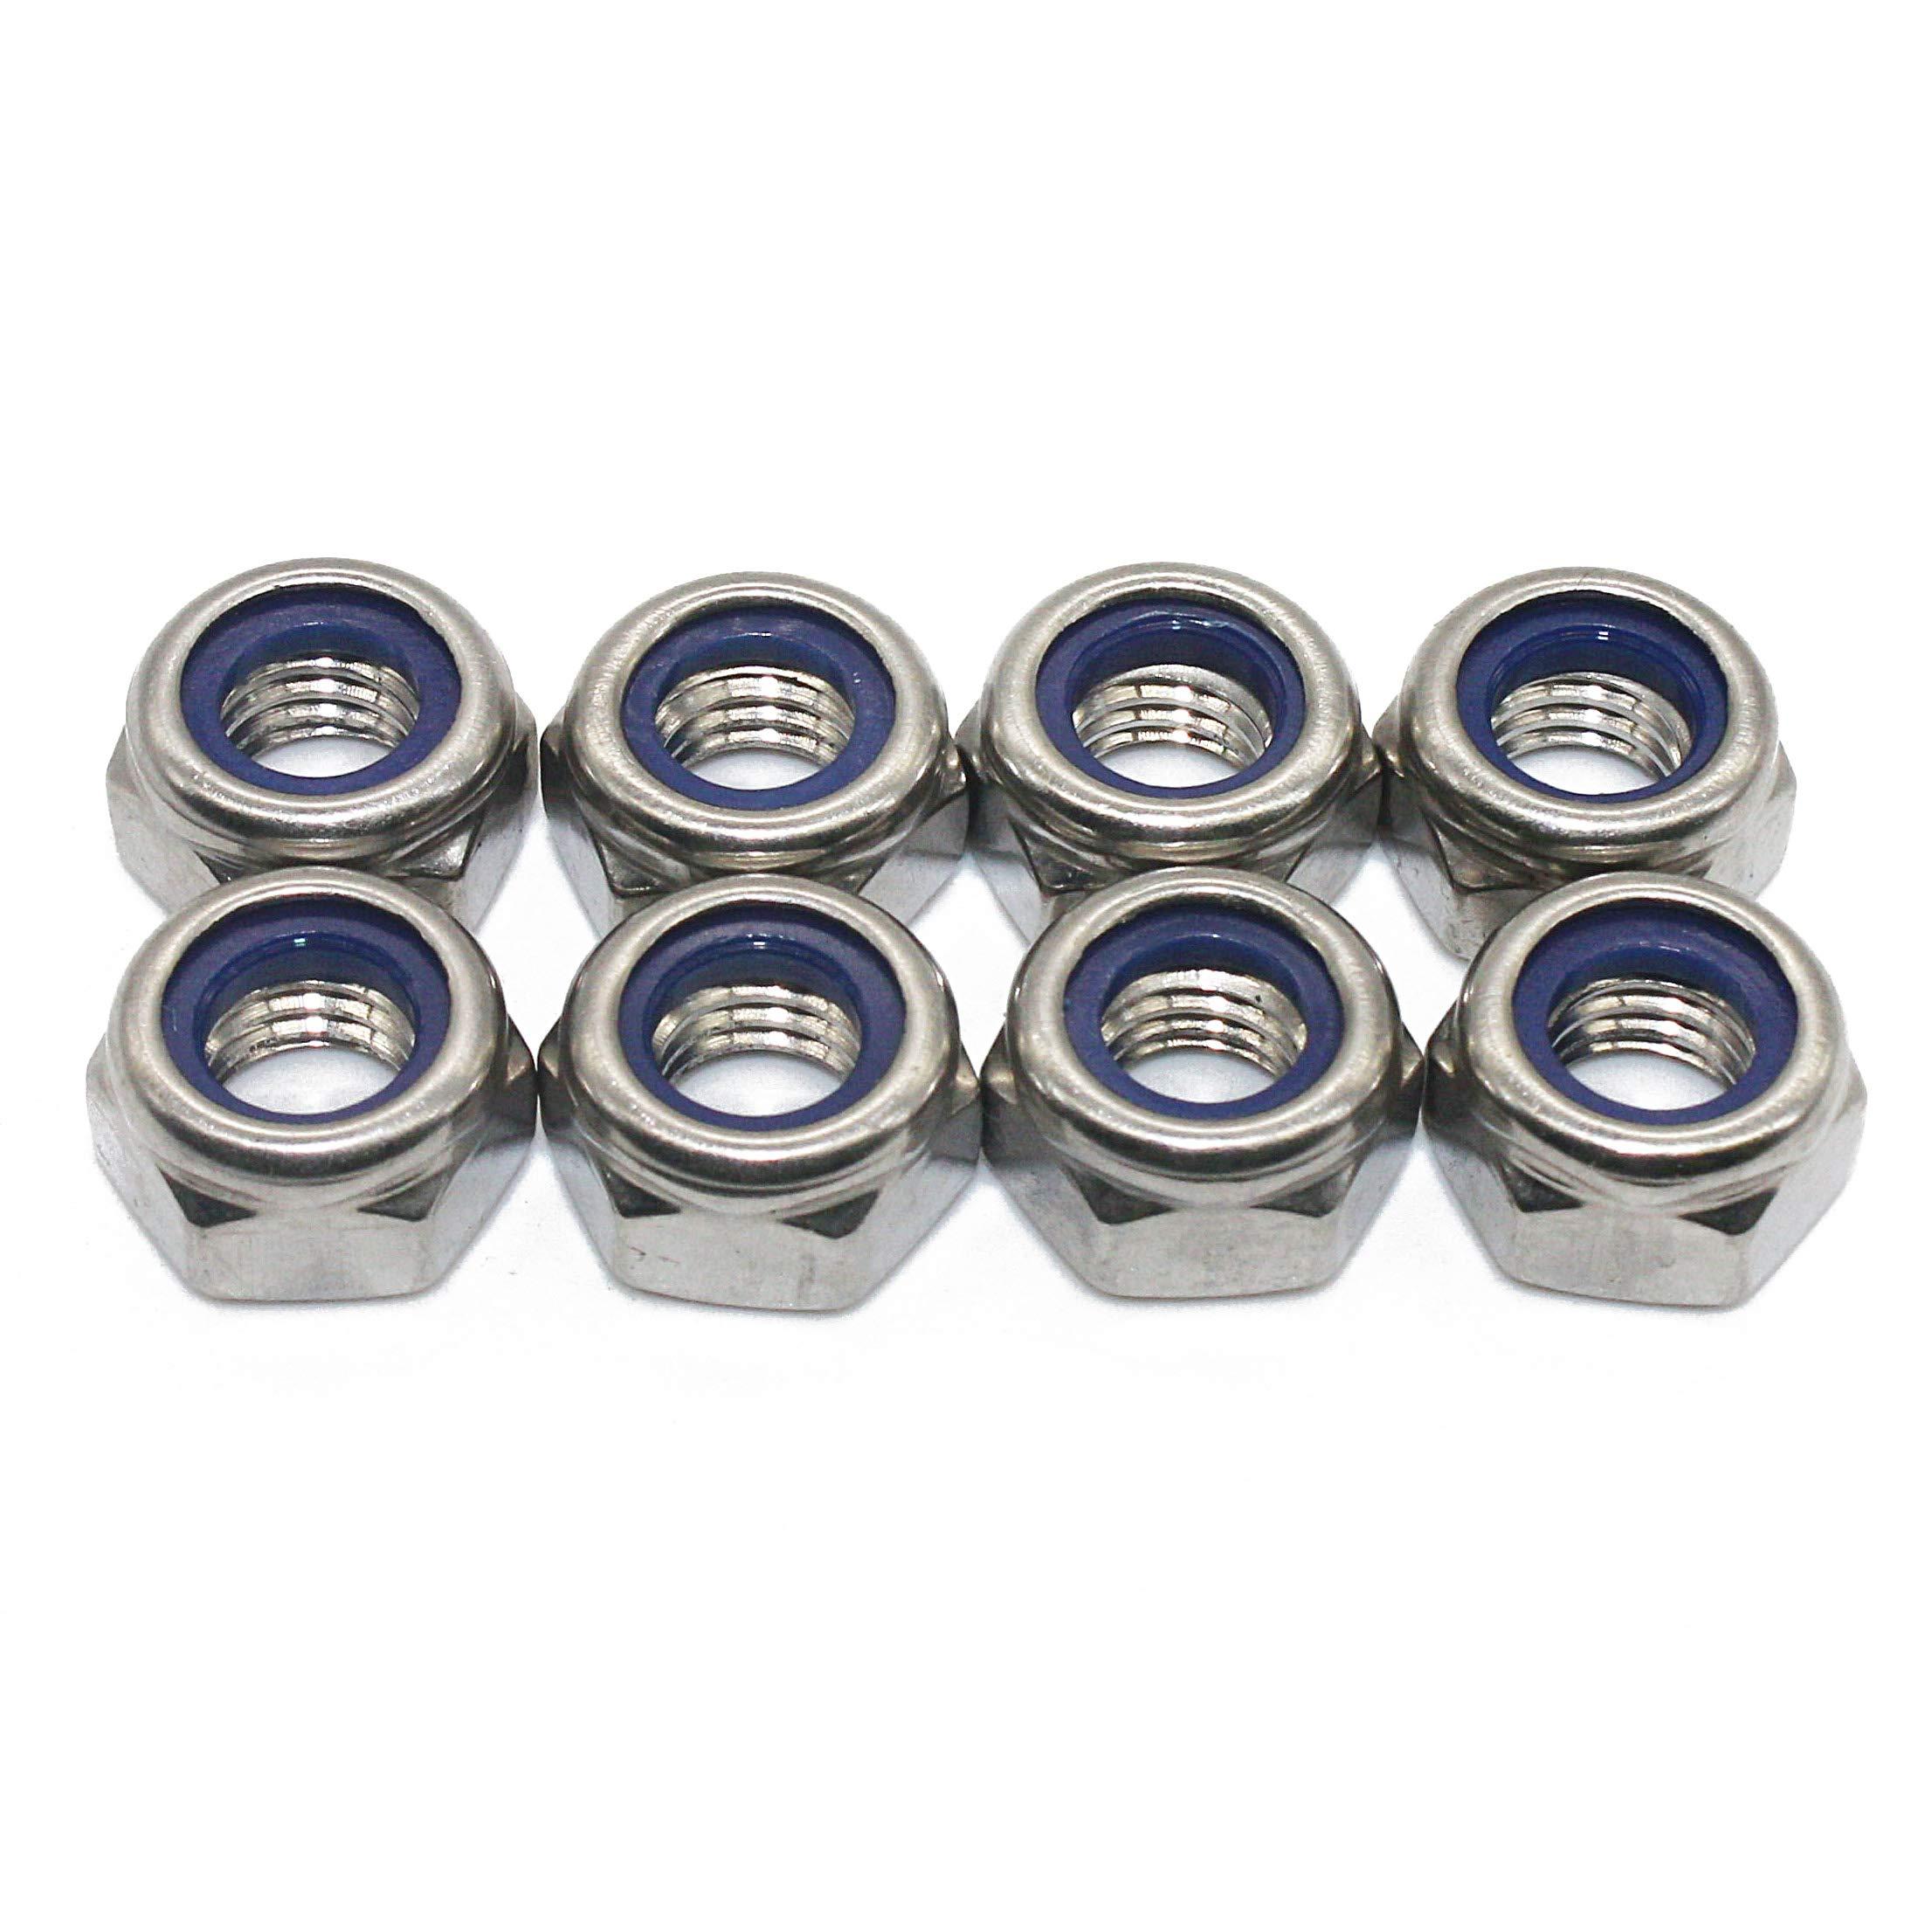 Fullerkreg M5 x 0.8mm DIN985 Self-Locking Nylon Insert Hex Lock Nuts,Stainless Steel A2-70/304/18-8,Plain Finish,Quantity 100PCS